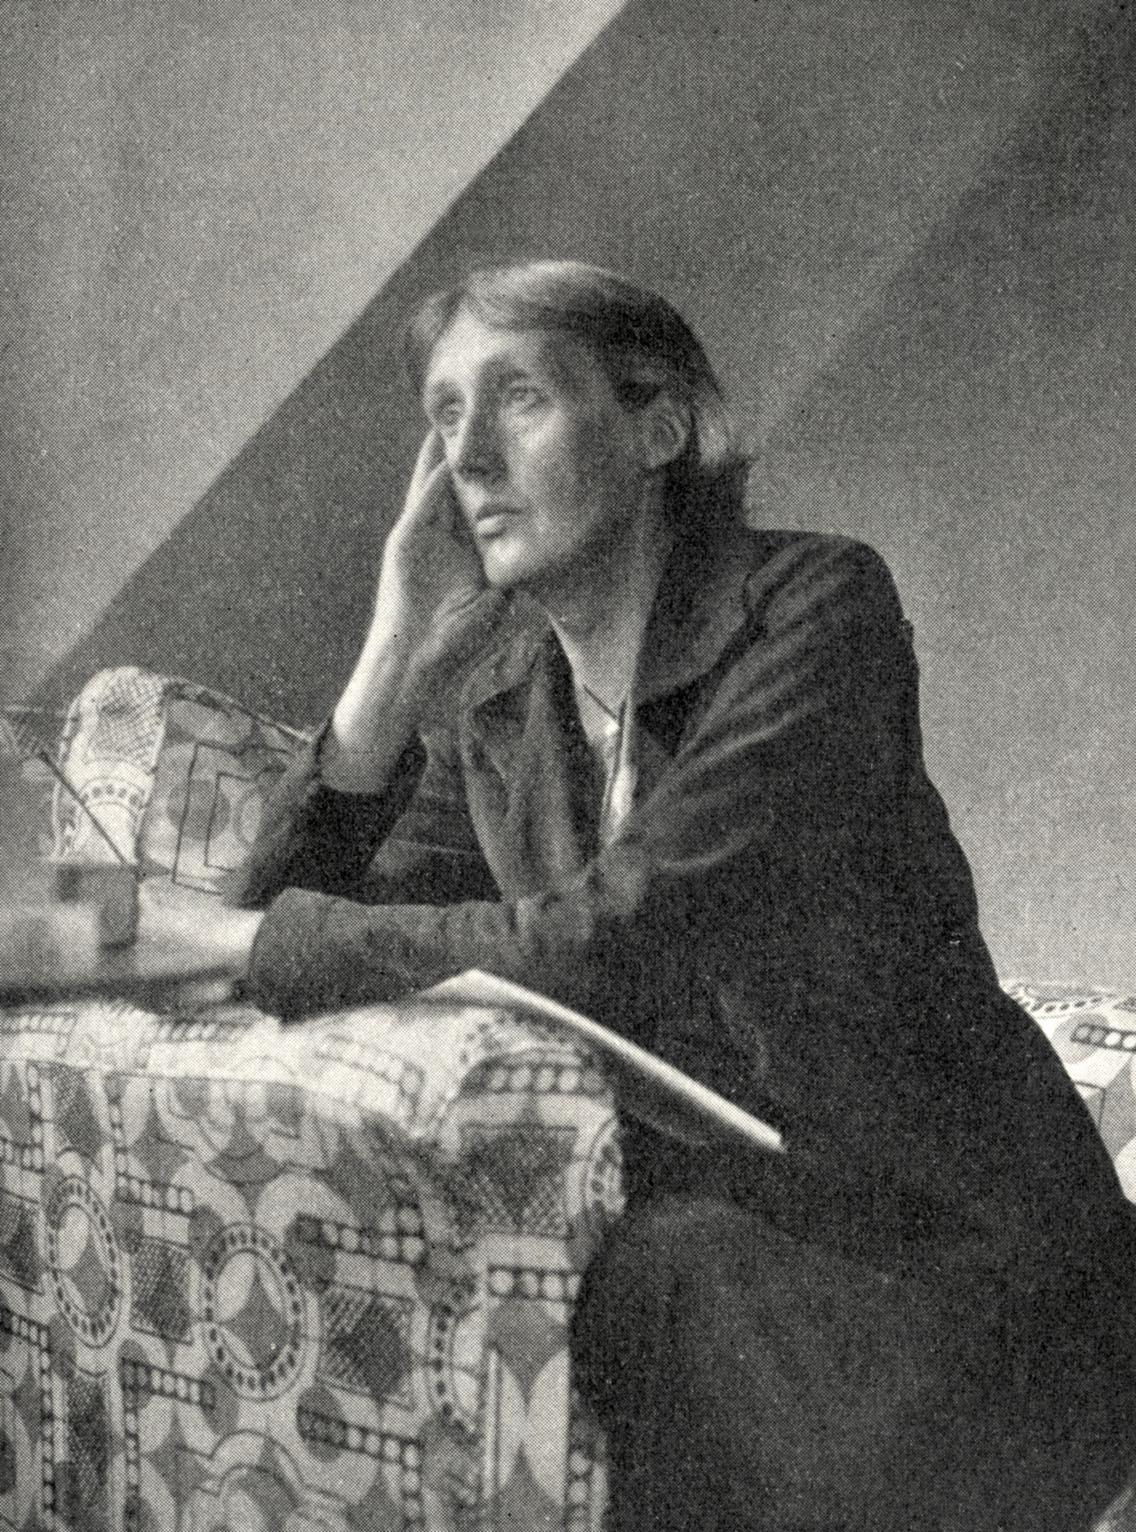 Virginia Woolf - portrait of the English novelist and essayist.